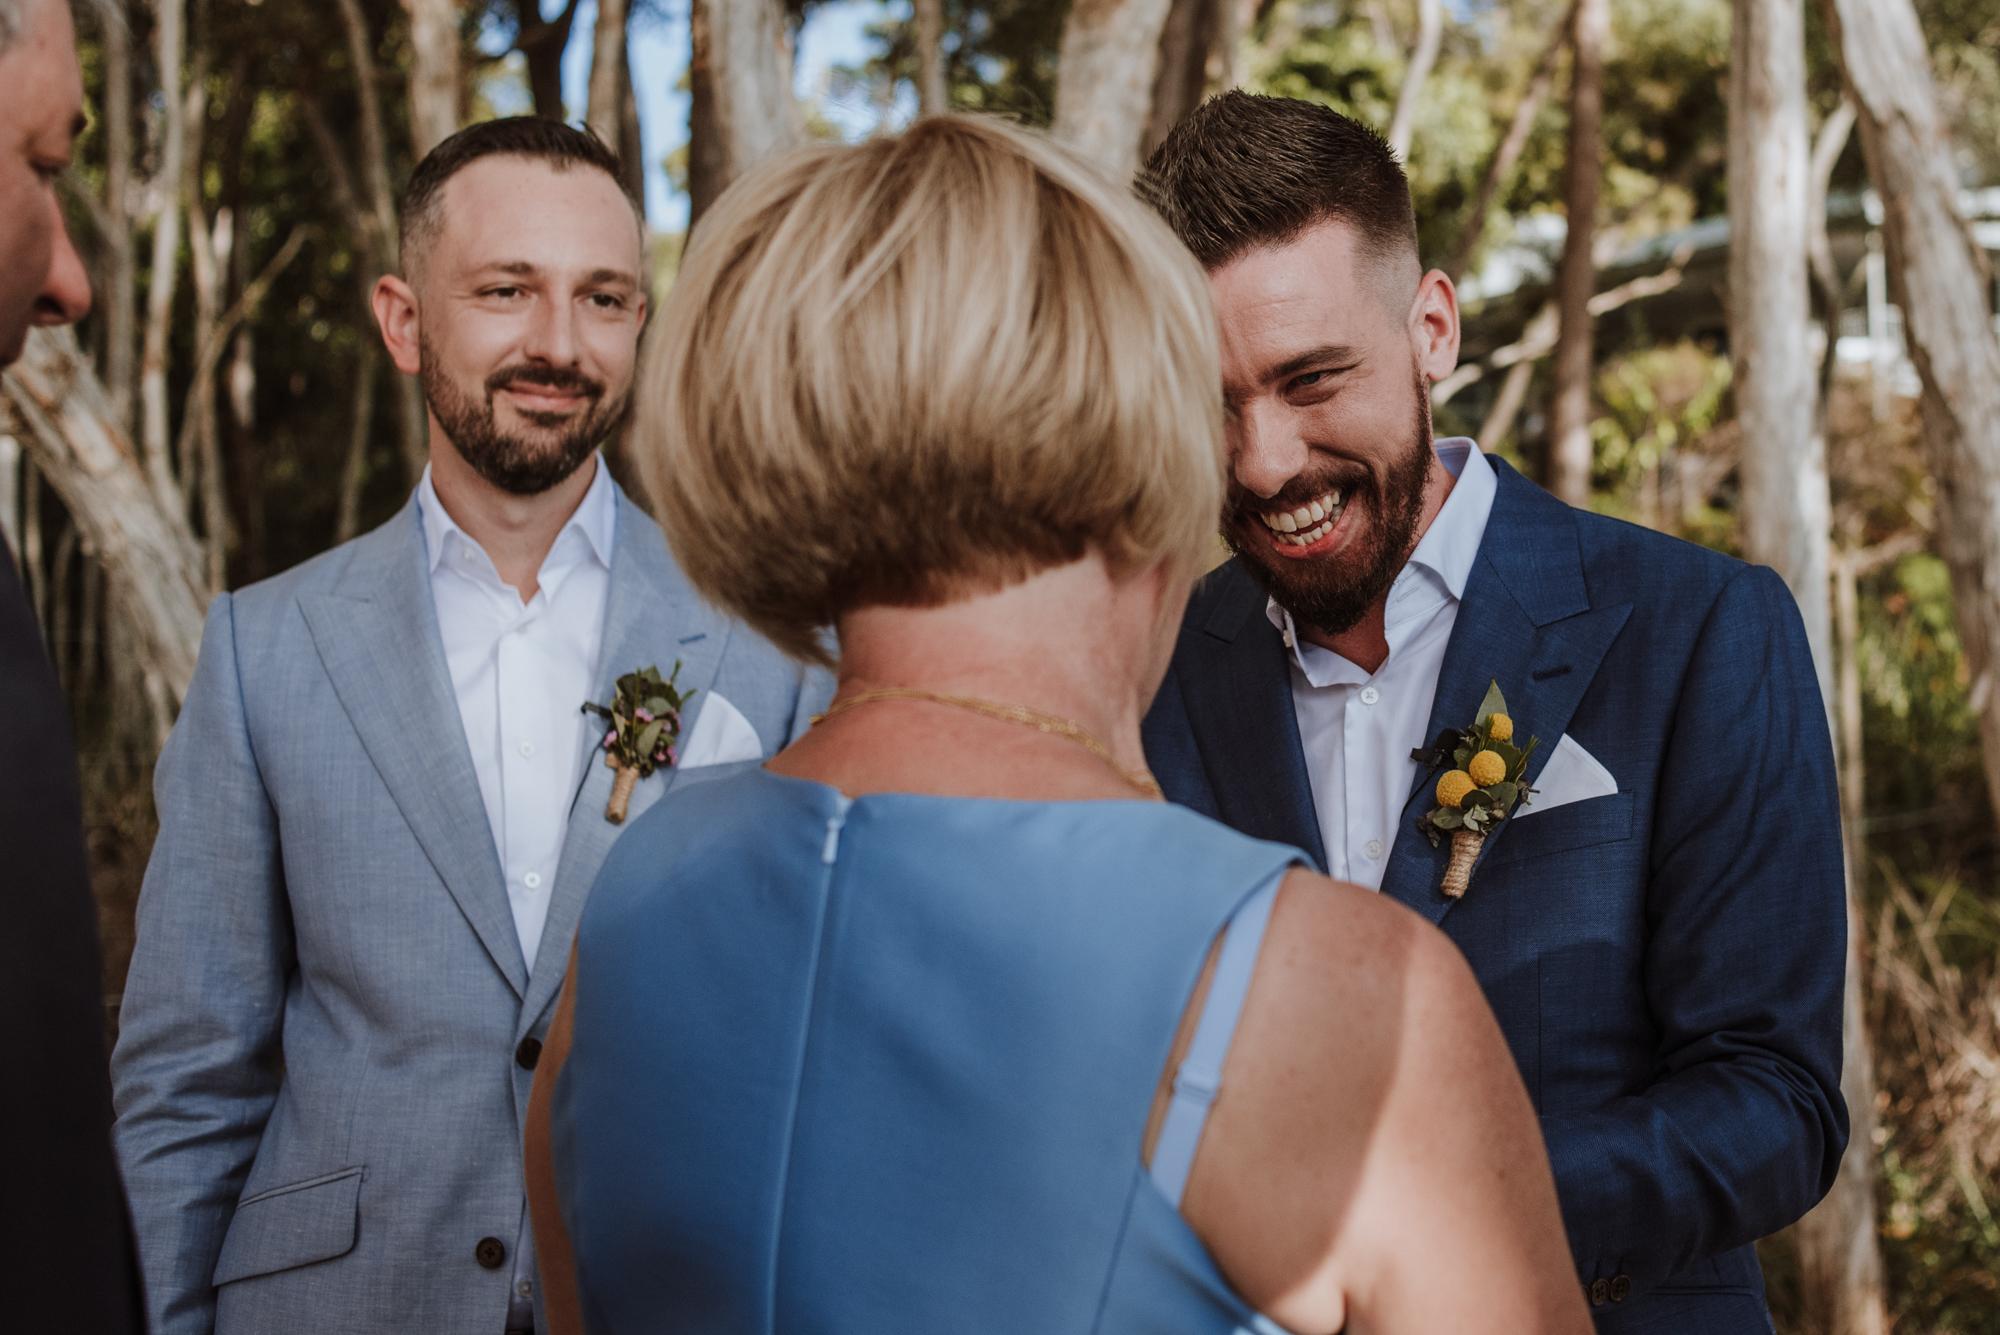 jessica-howard-photography-sean-alessandro-wedding-day-web-292.jpg